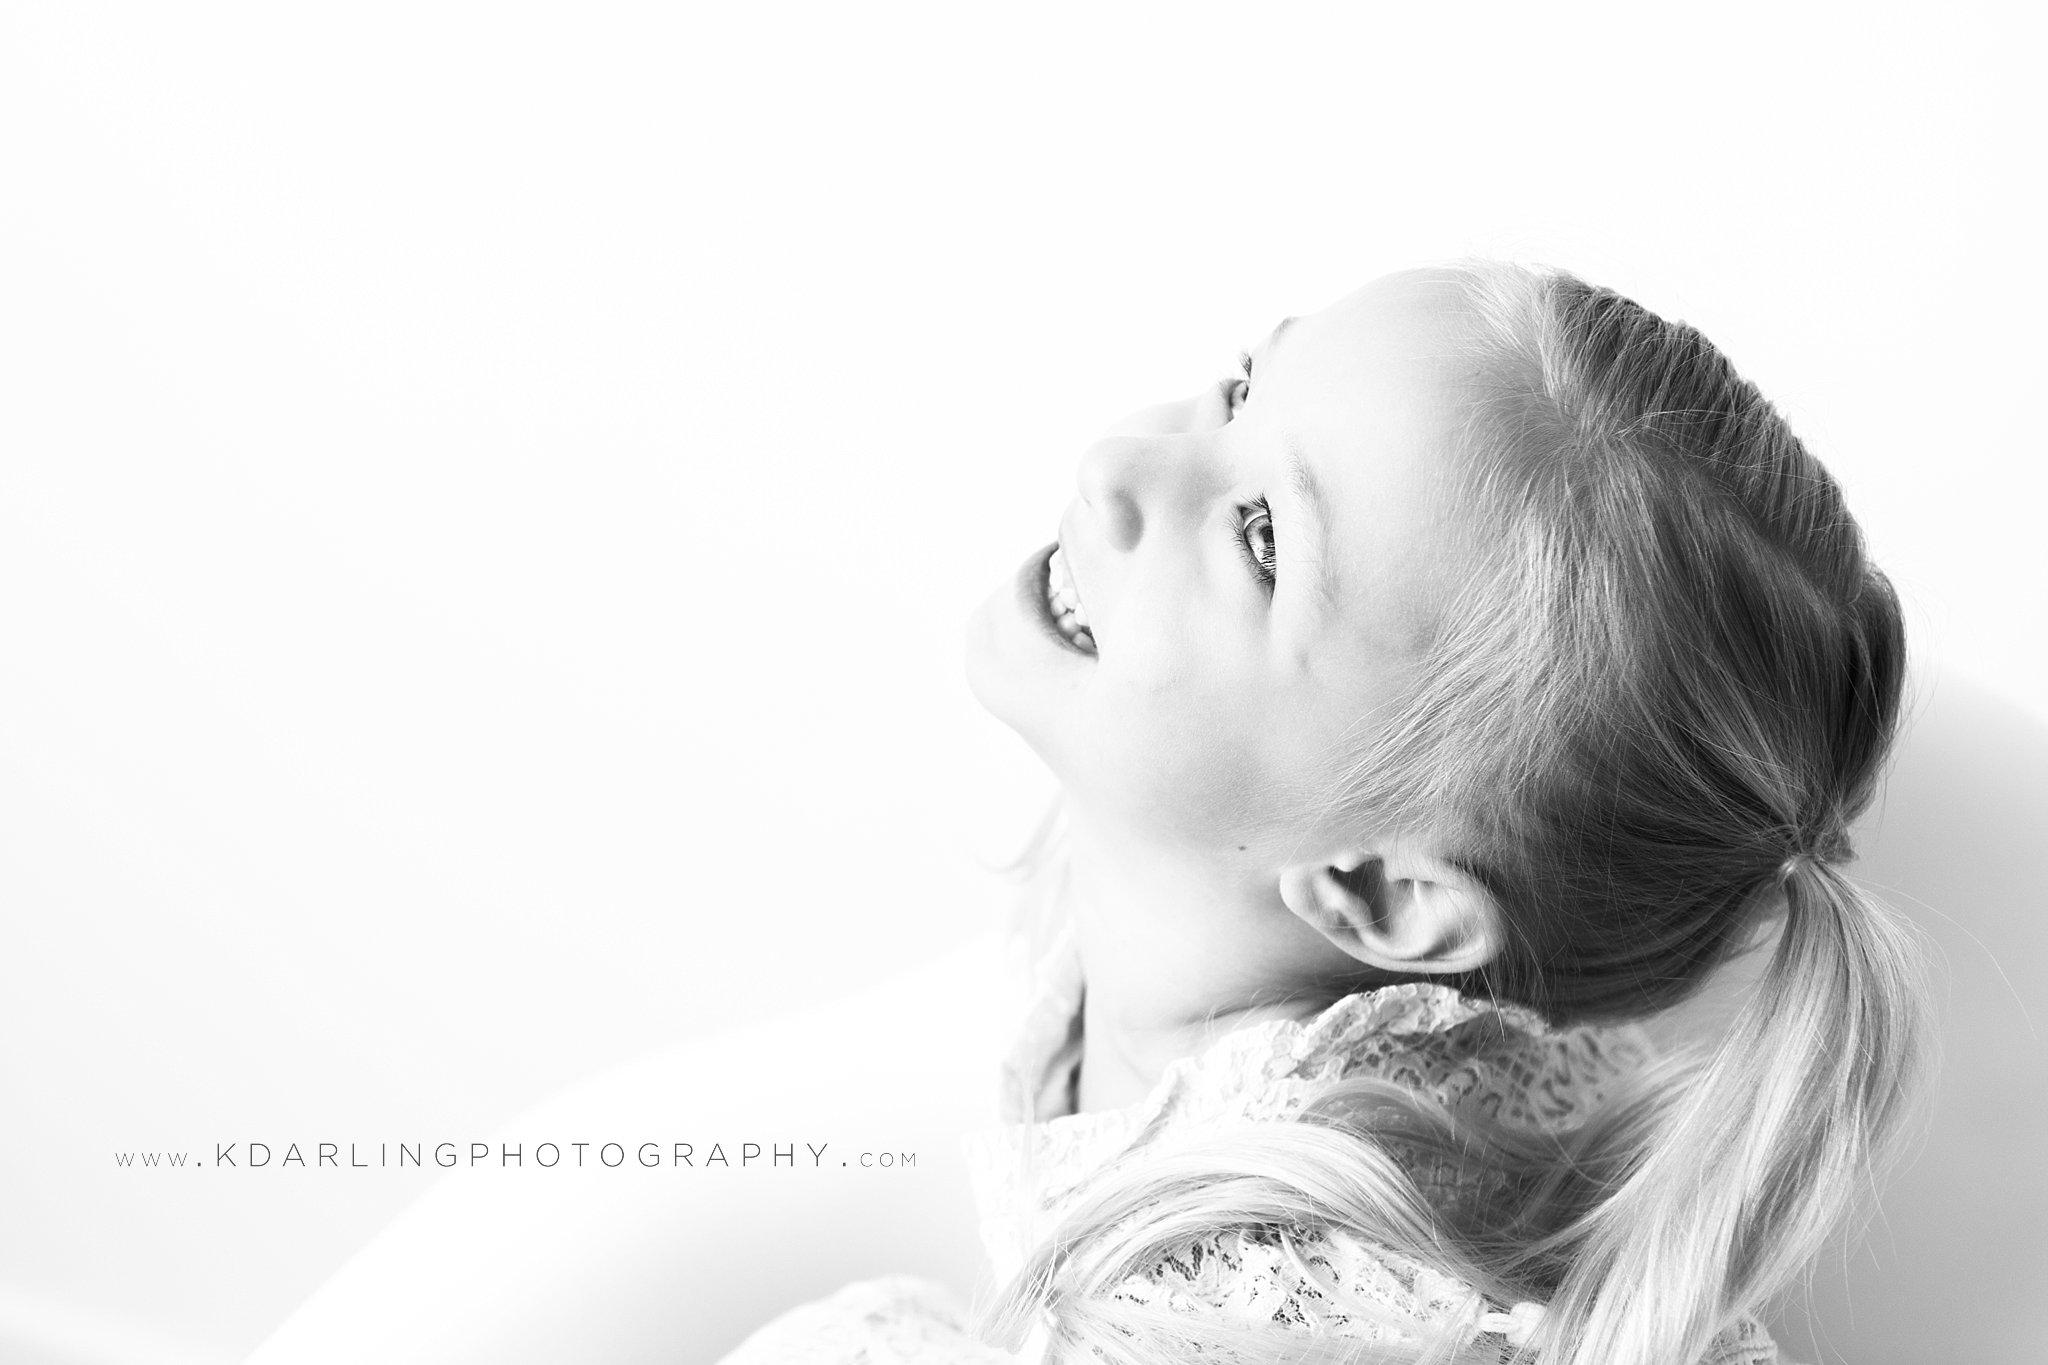 Child-Photographer-portraits-Champaign-County-IL-Fisher-Studio-Darling_0187.jpg